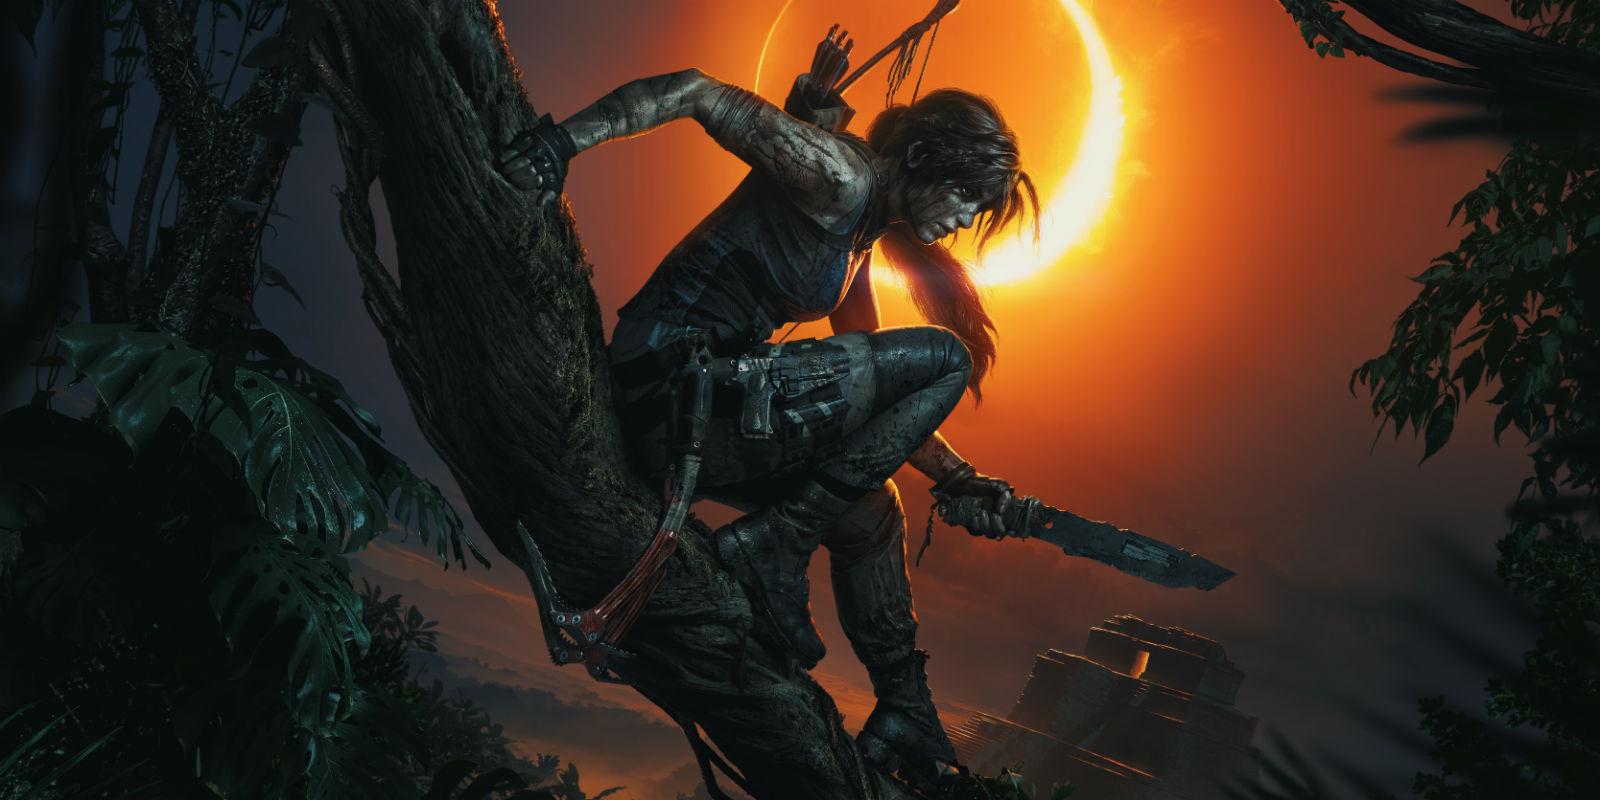 Shadow-of-the-Tomb-Raider-art.jpg